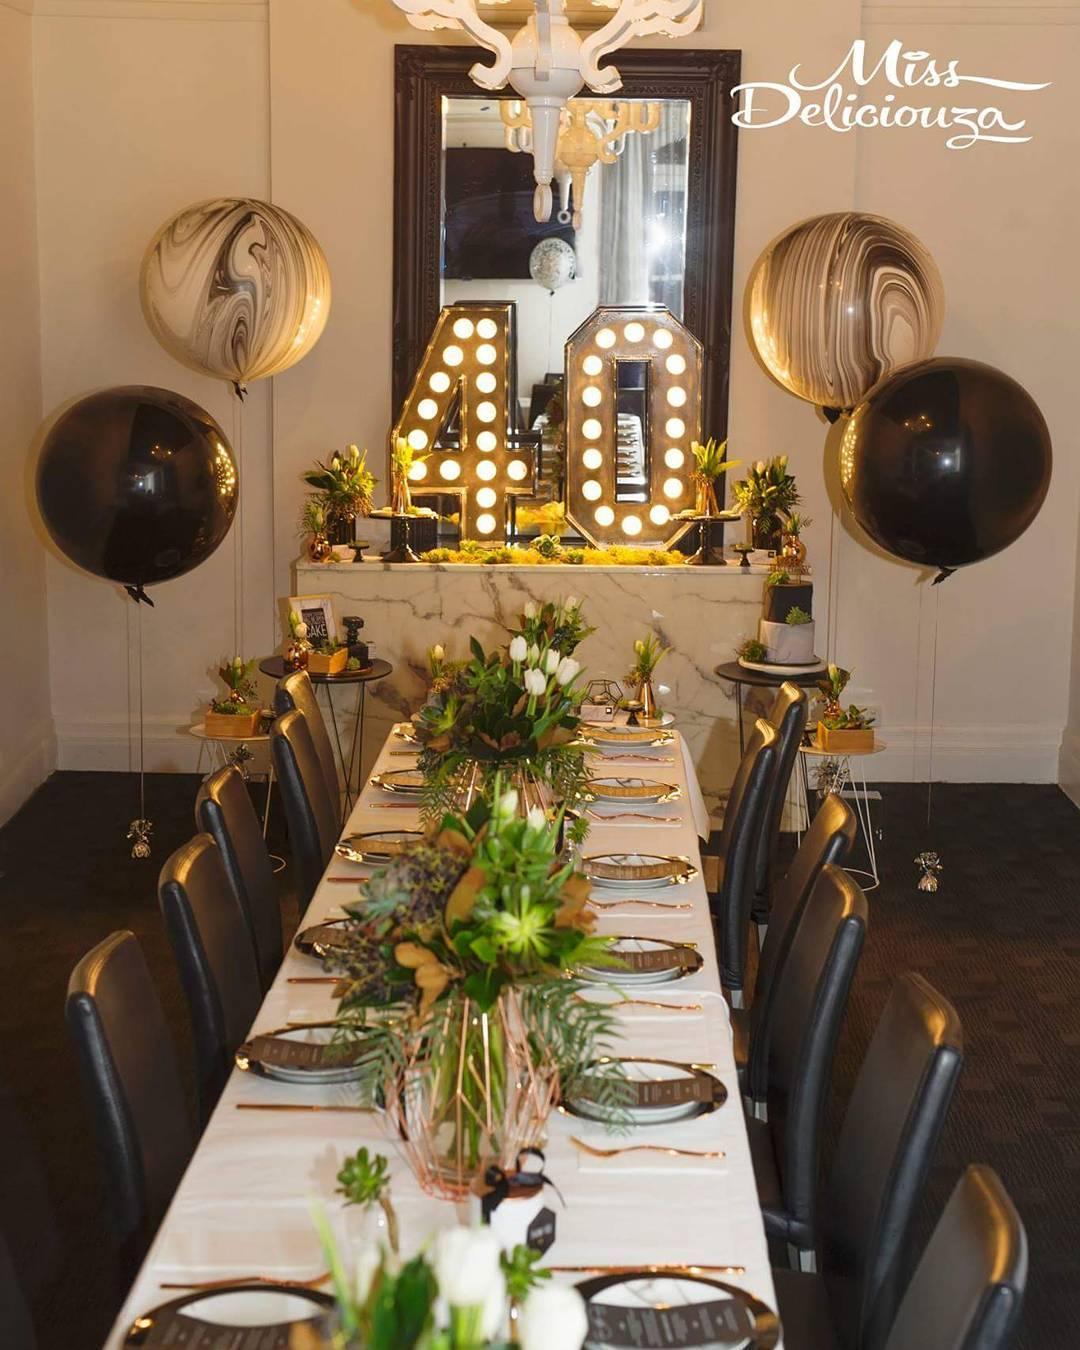 Ideas para decorar cumplea os de 40 mujer como organizar for Ideas para decorar y organizar la casa